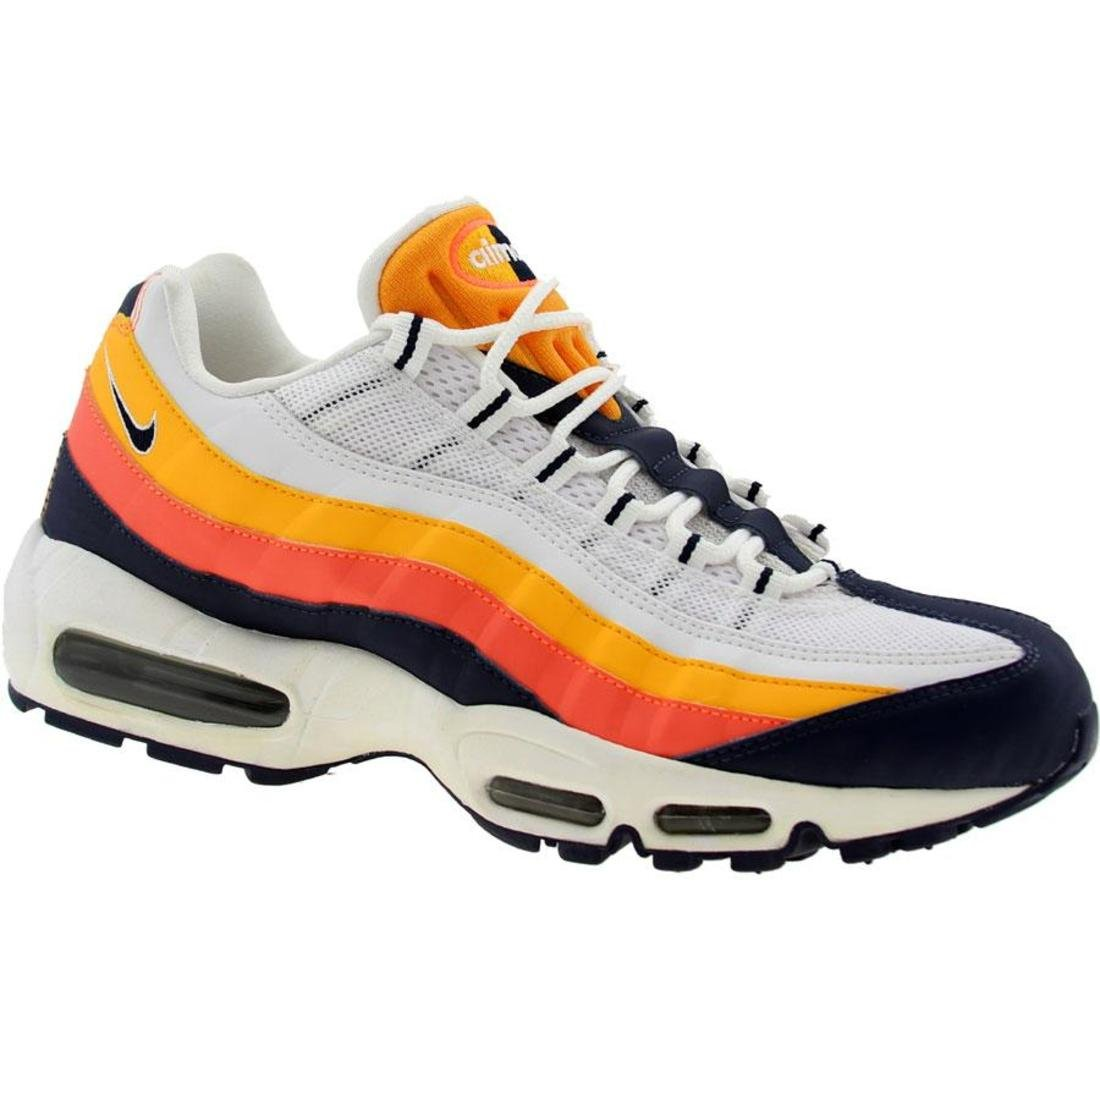 rojo Nike Air MAX 95 gris Deporte rojo para Hombre Hauszapatos de Running 609048 – 165